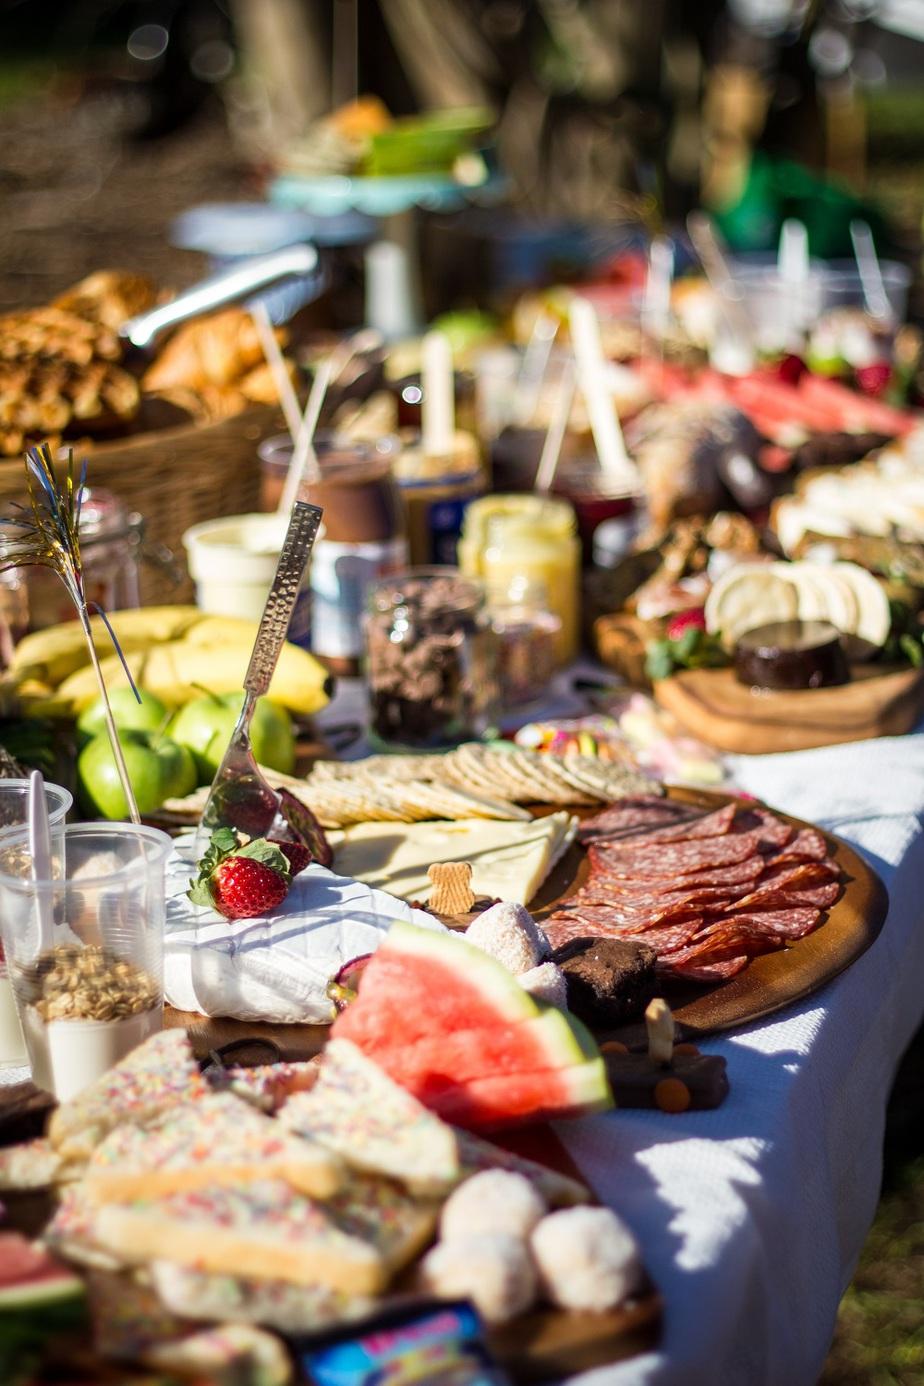 Wedding reception buffet menu ideas on a budget. Amazing Ways to Save on Wedding Food & Drink Costs - Tips & Ideas.